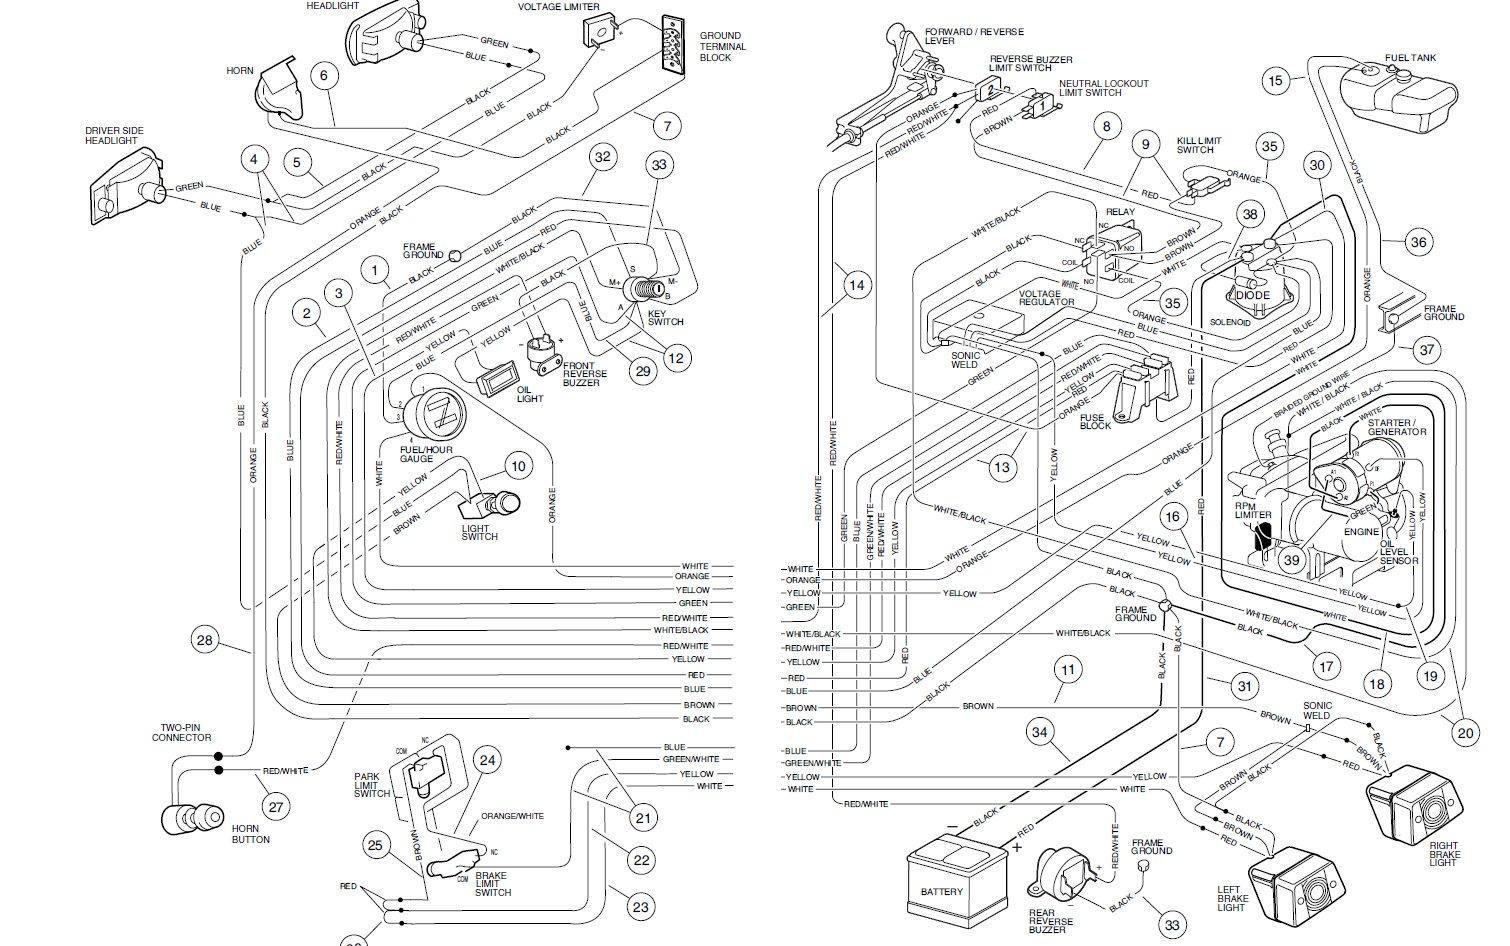 gem cart wiring diagram gem car 48 volt wiring diagram pandemi wiro thedotproject co  gem car 48 volt wiring diagram